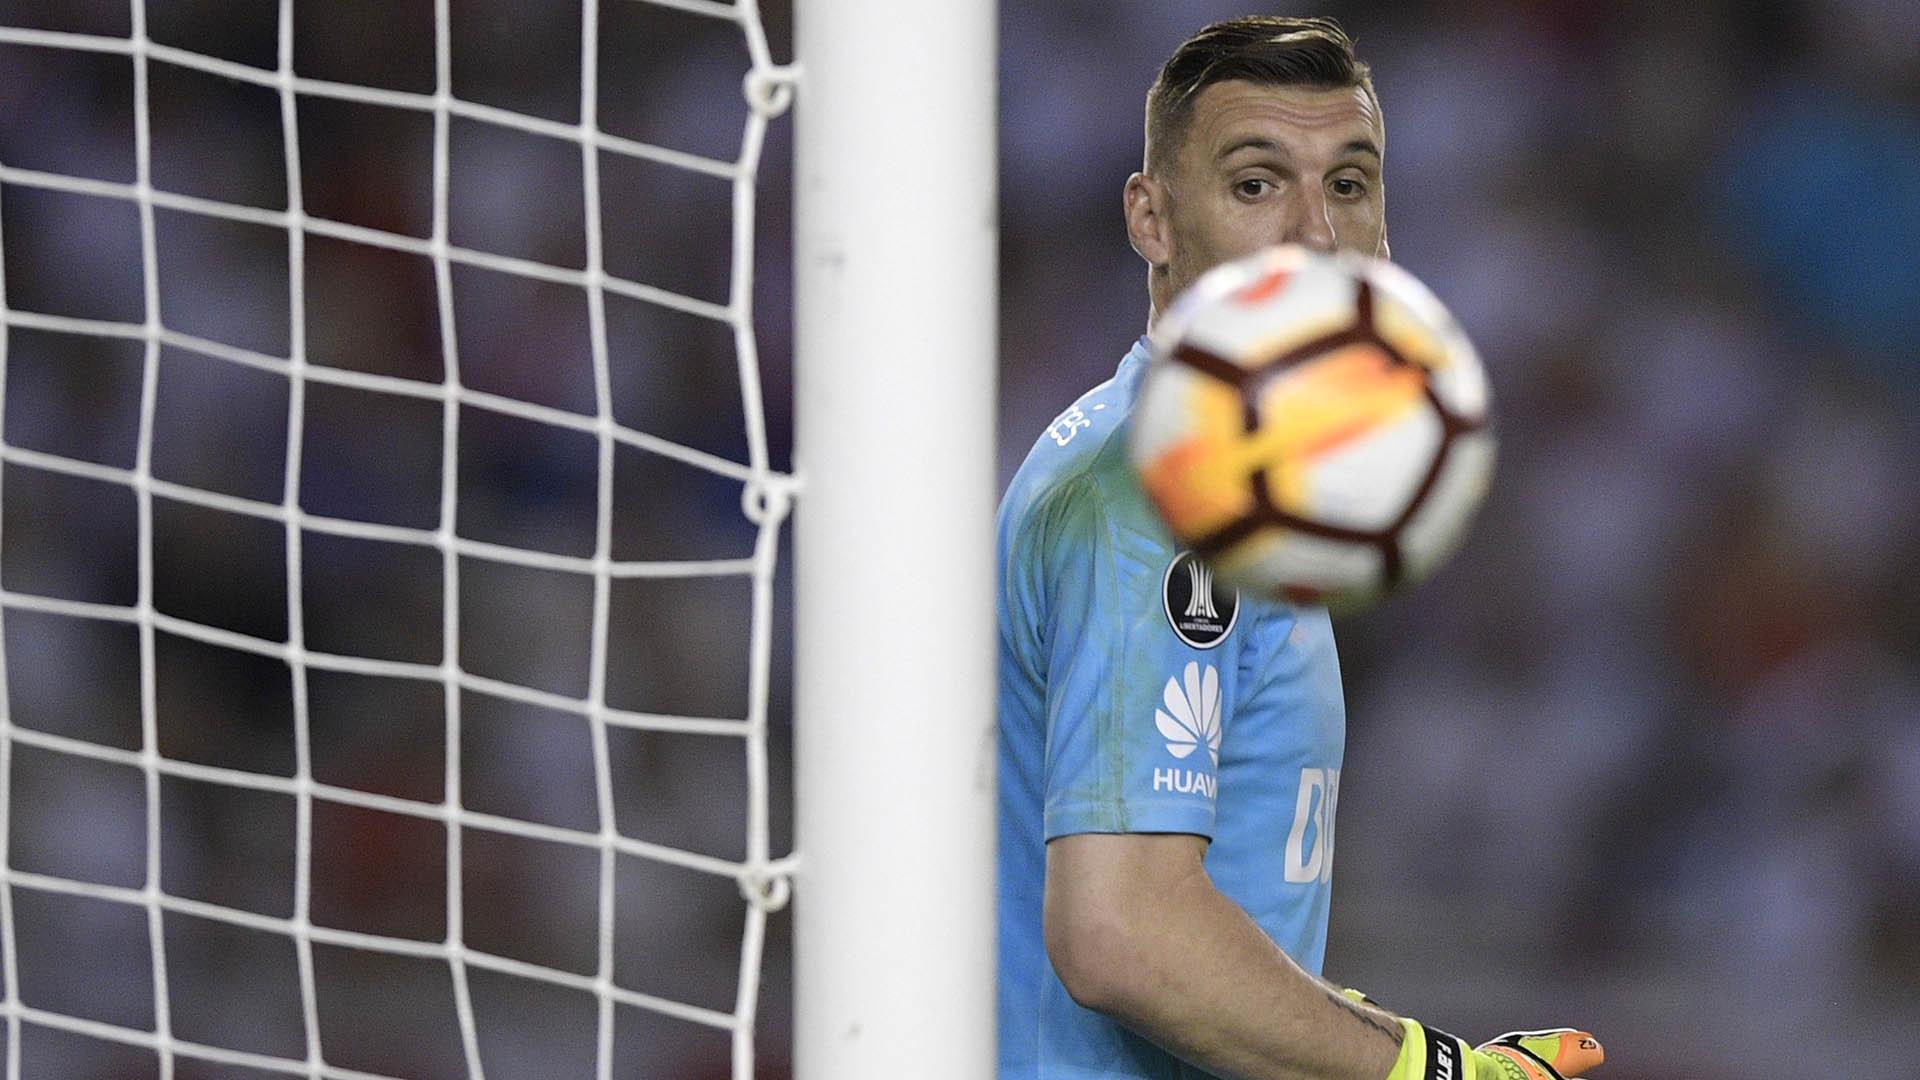 Ojos en la pelota para Franco Armani. Según Fantino, debe ser titular. (Foto: AFP)